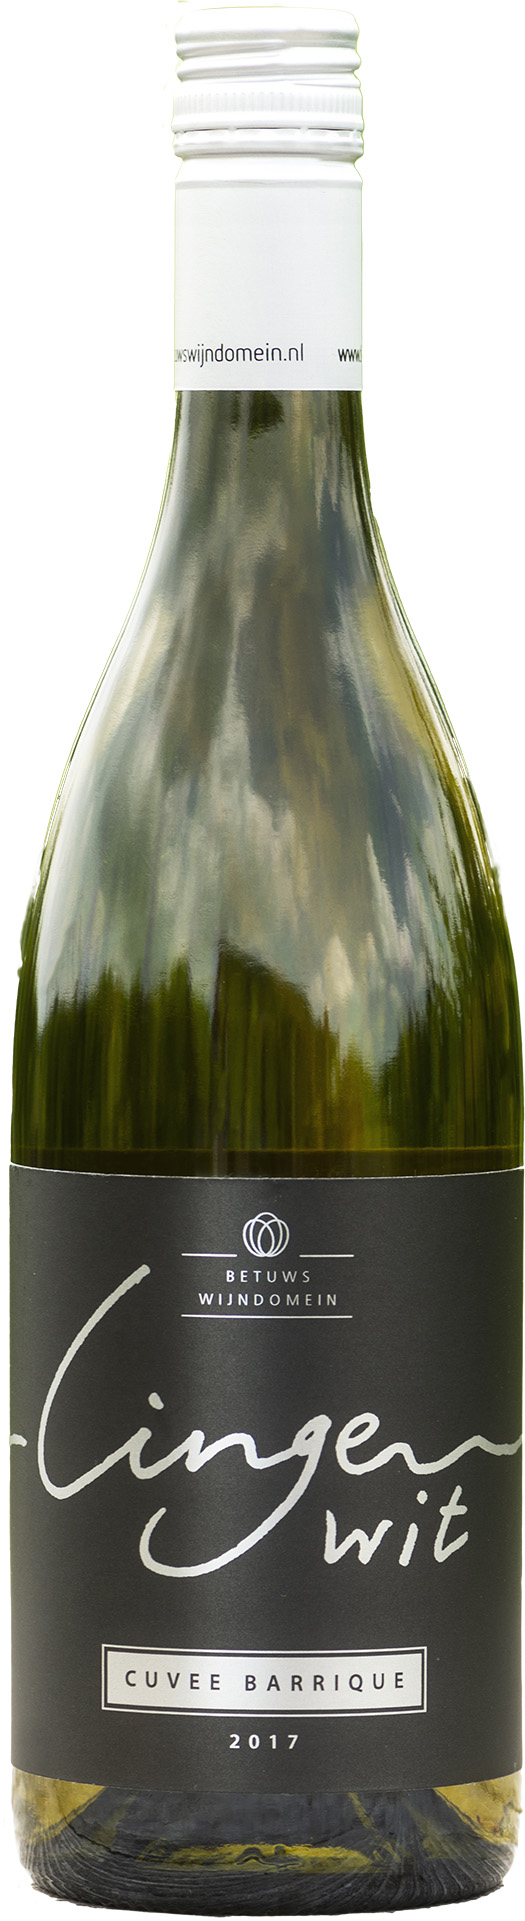 Betuws Wijndomein - Linge Wit Cuvée Barrique